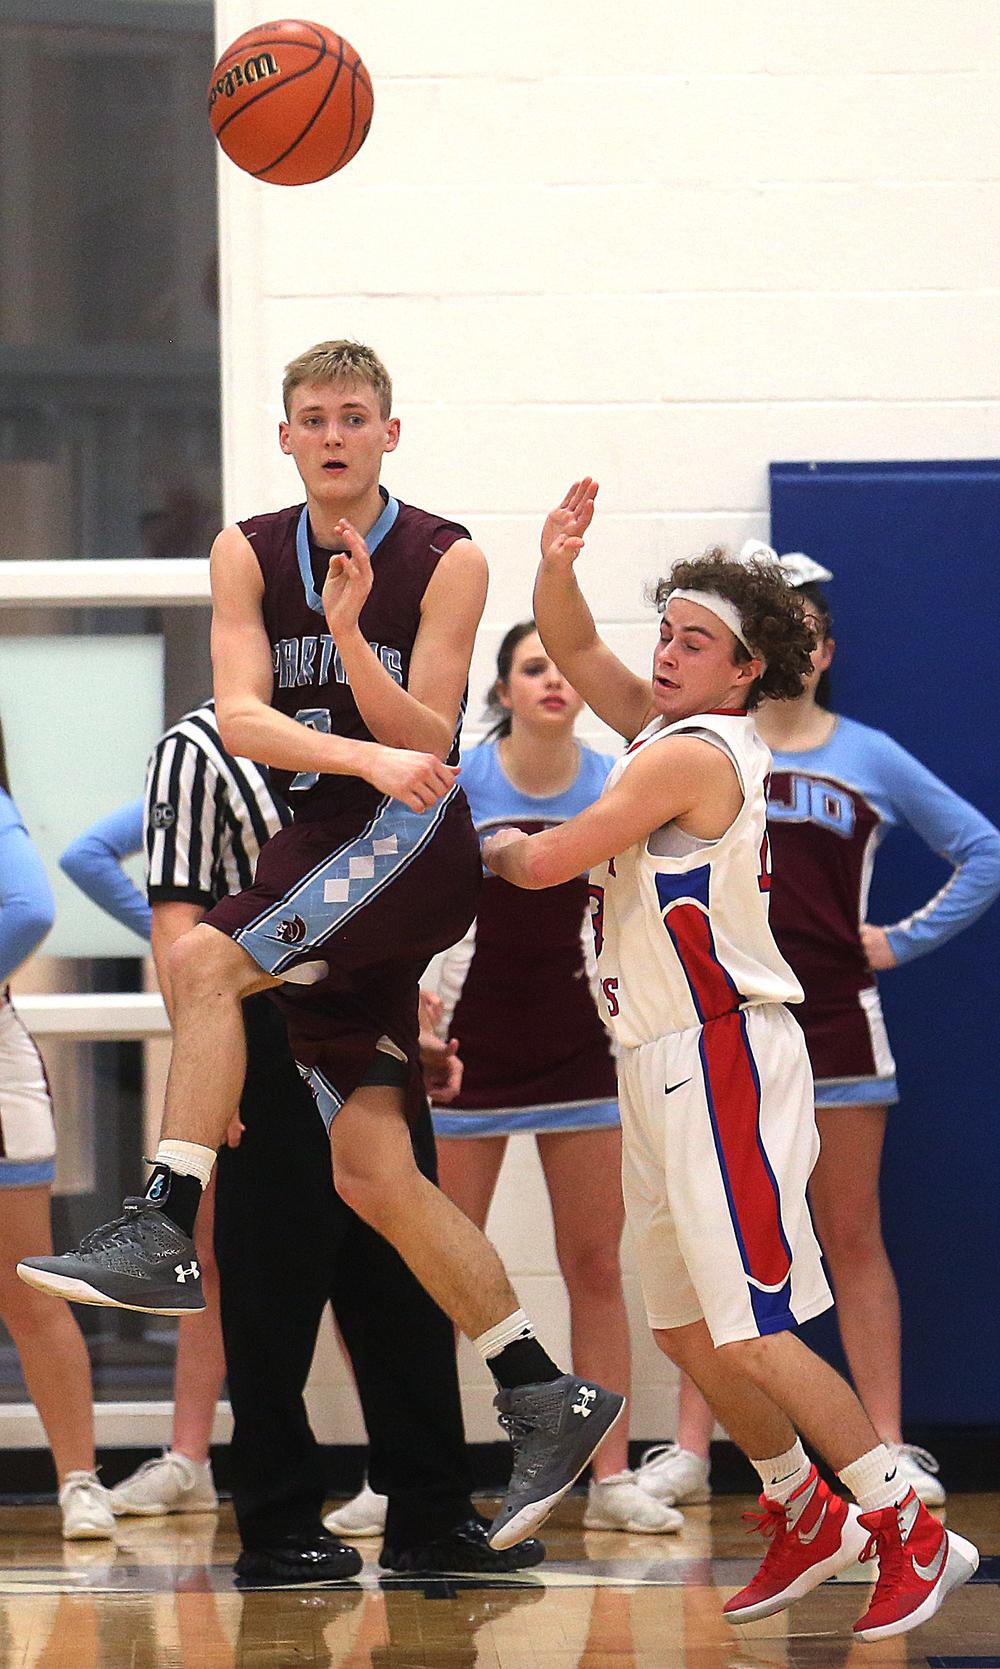 St. Joseph-Ogden player Brandon Trimble whips a pass downcourt. David Spencer/The State Journal Register